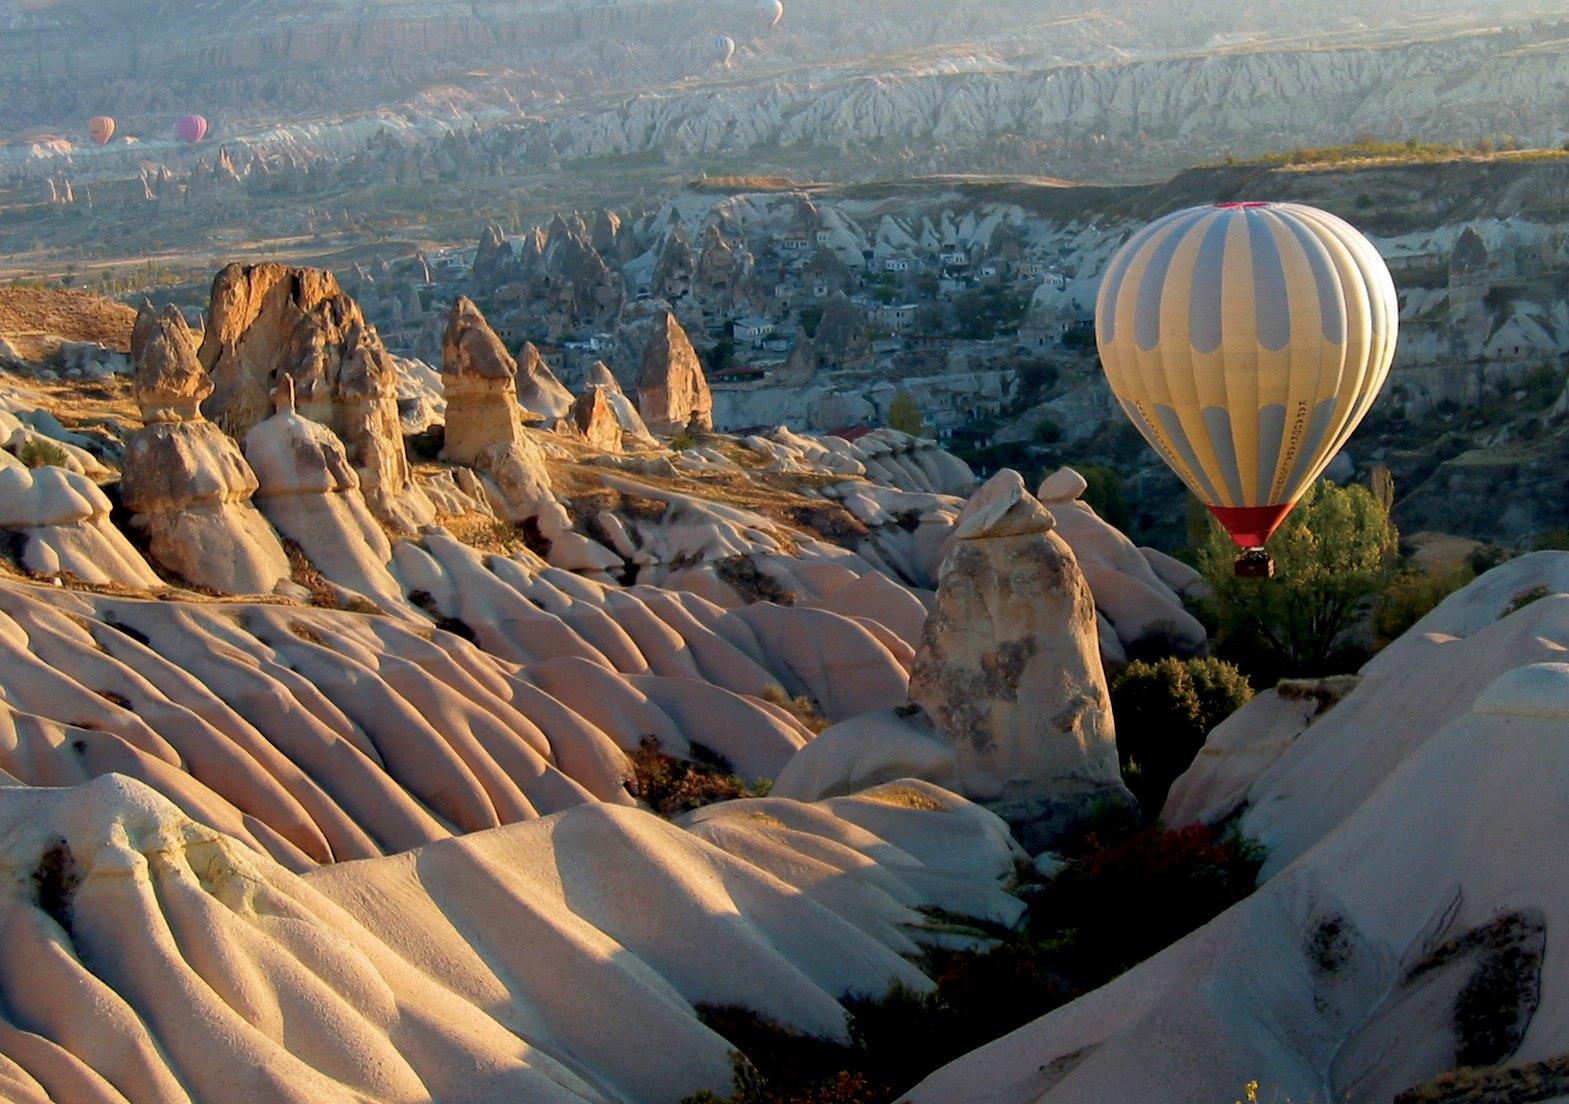 http://www.prasannaholidays.com/wp-content/uploads/2014/05/Eco-Turkey-Cappadocia1-1-1.jpg